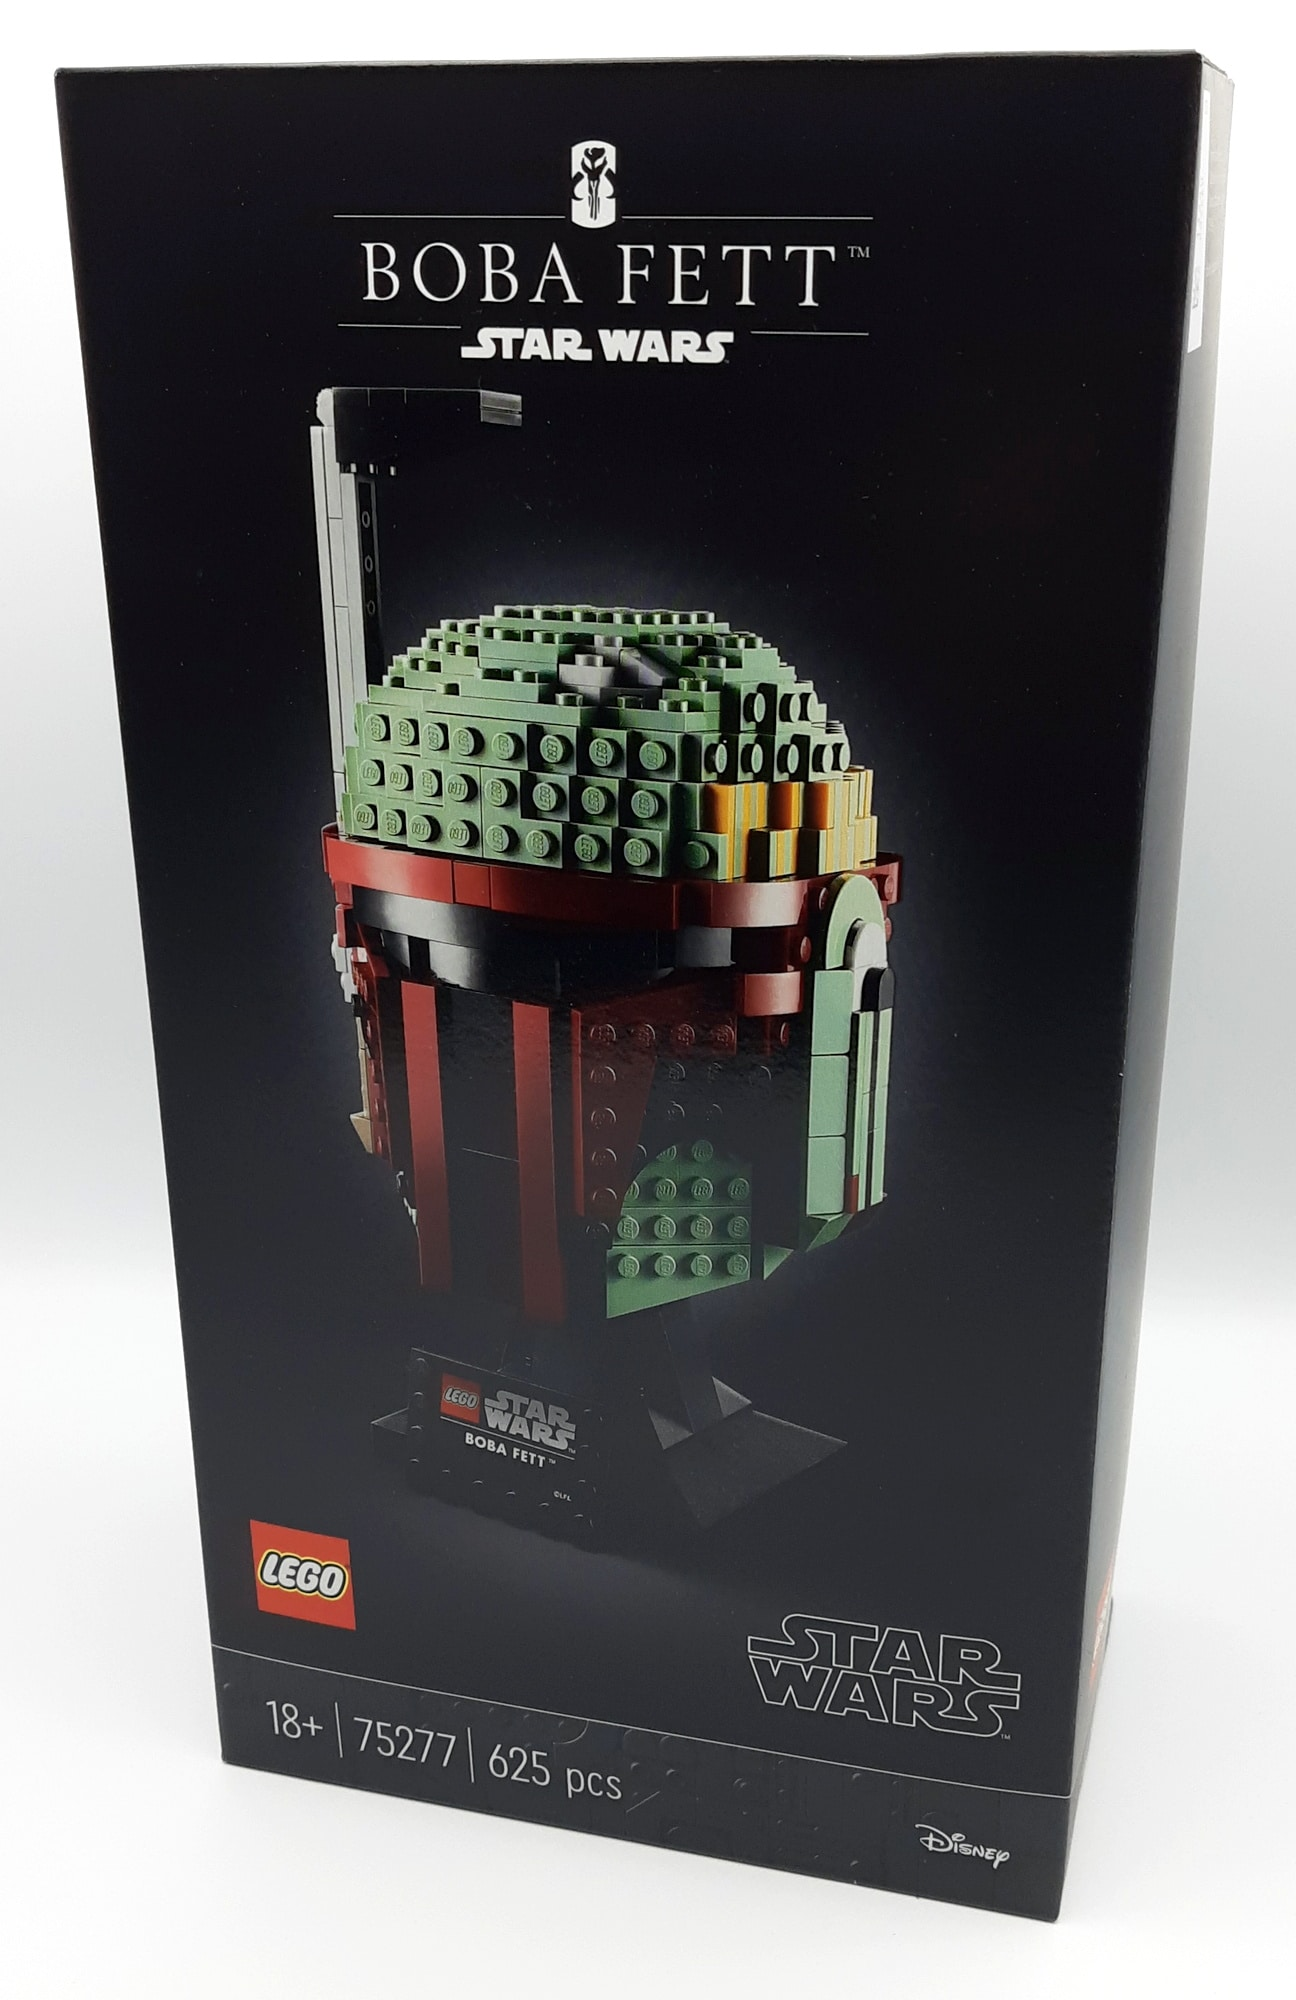 LEGO 75277 Boba Fett Helm Box Vorne